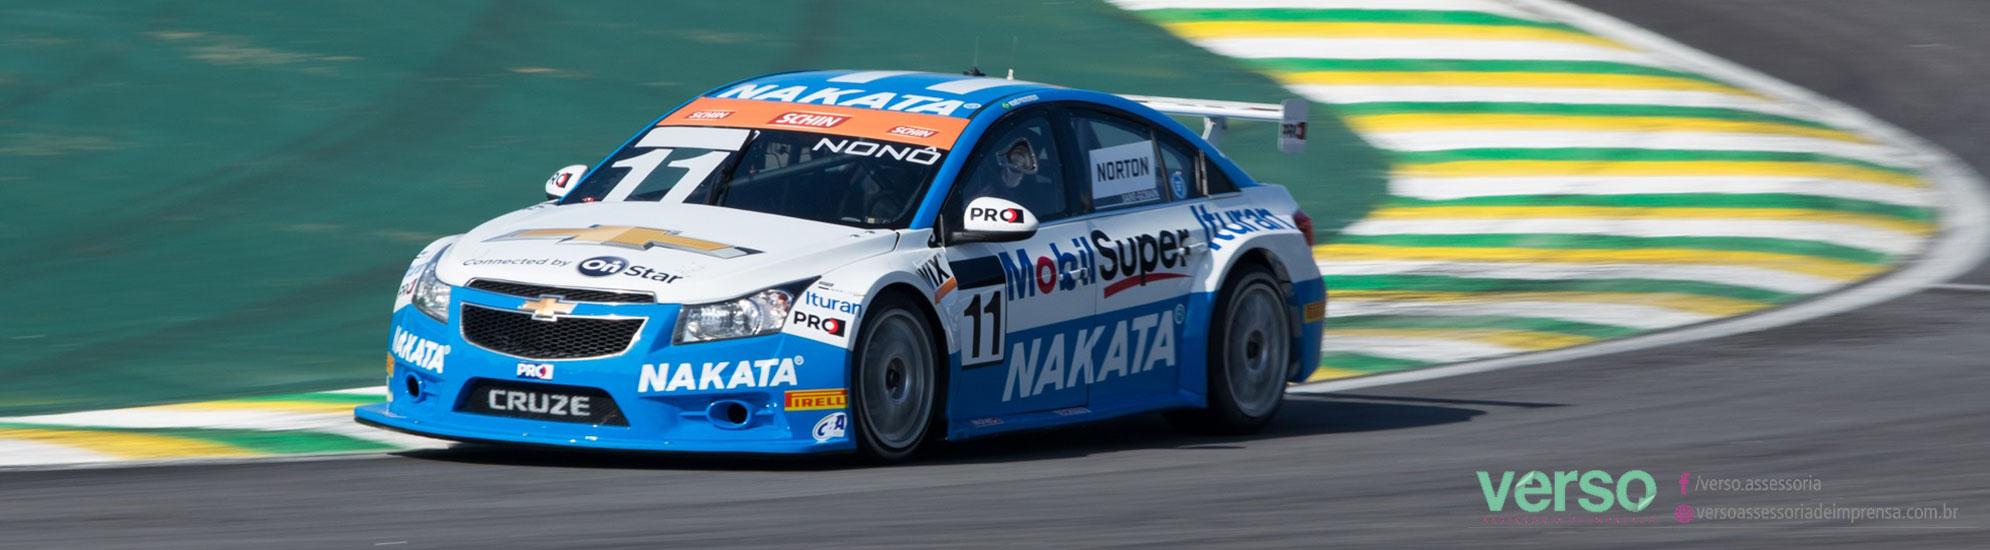 Banner-Onze-Motorsports_Equipe-Nakata_Verso,